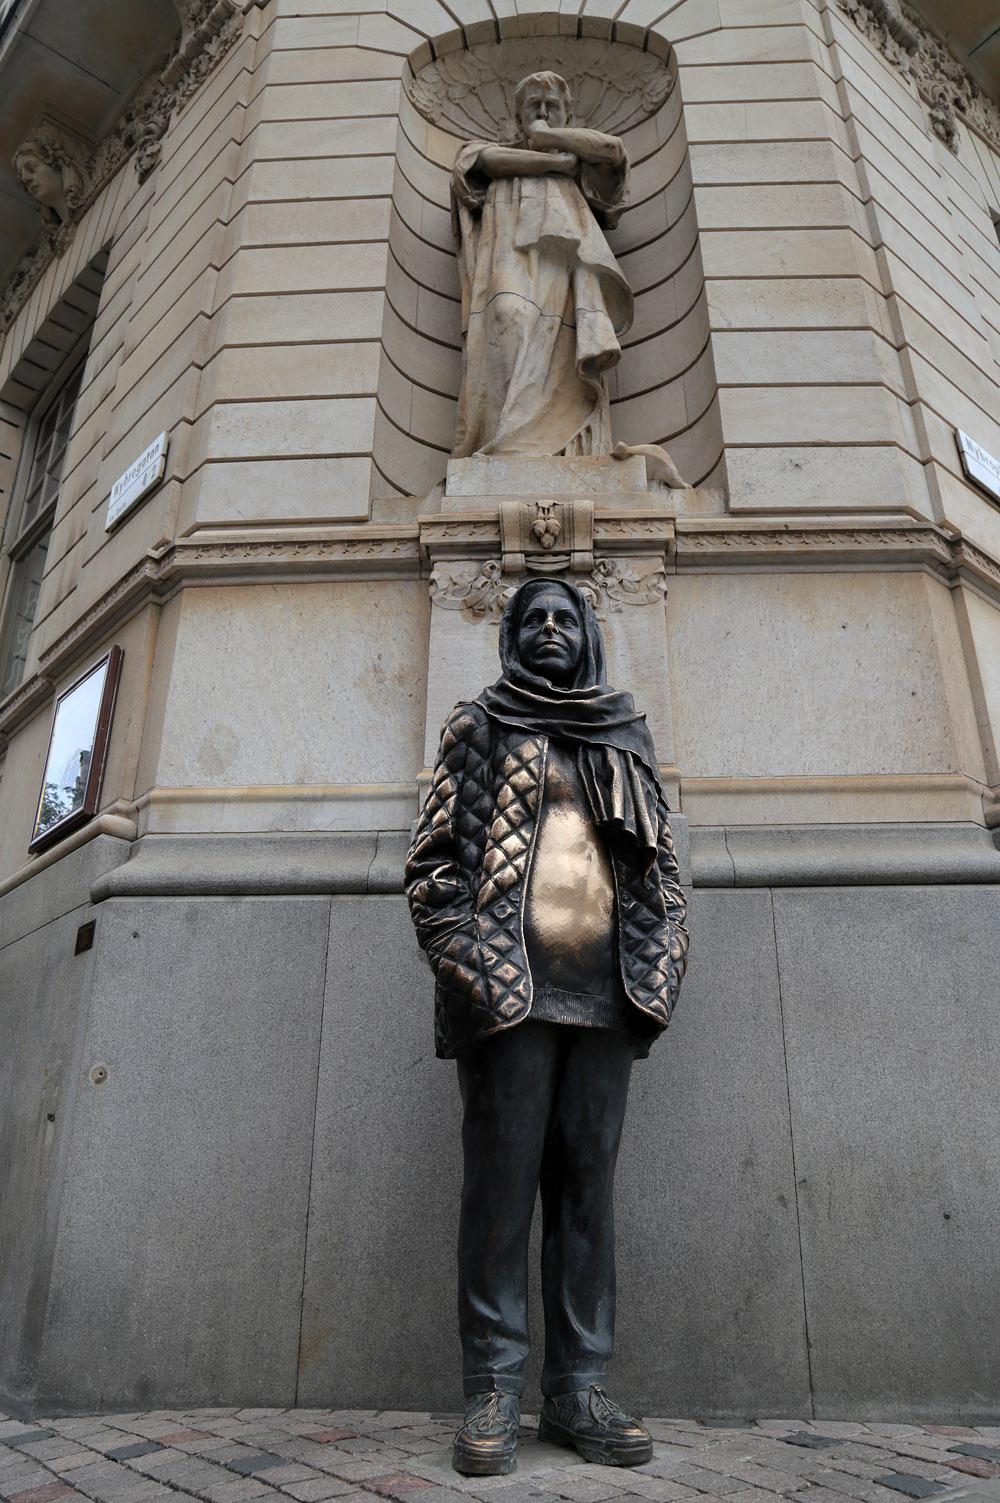 19-streetsculpture